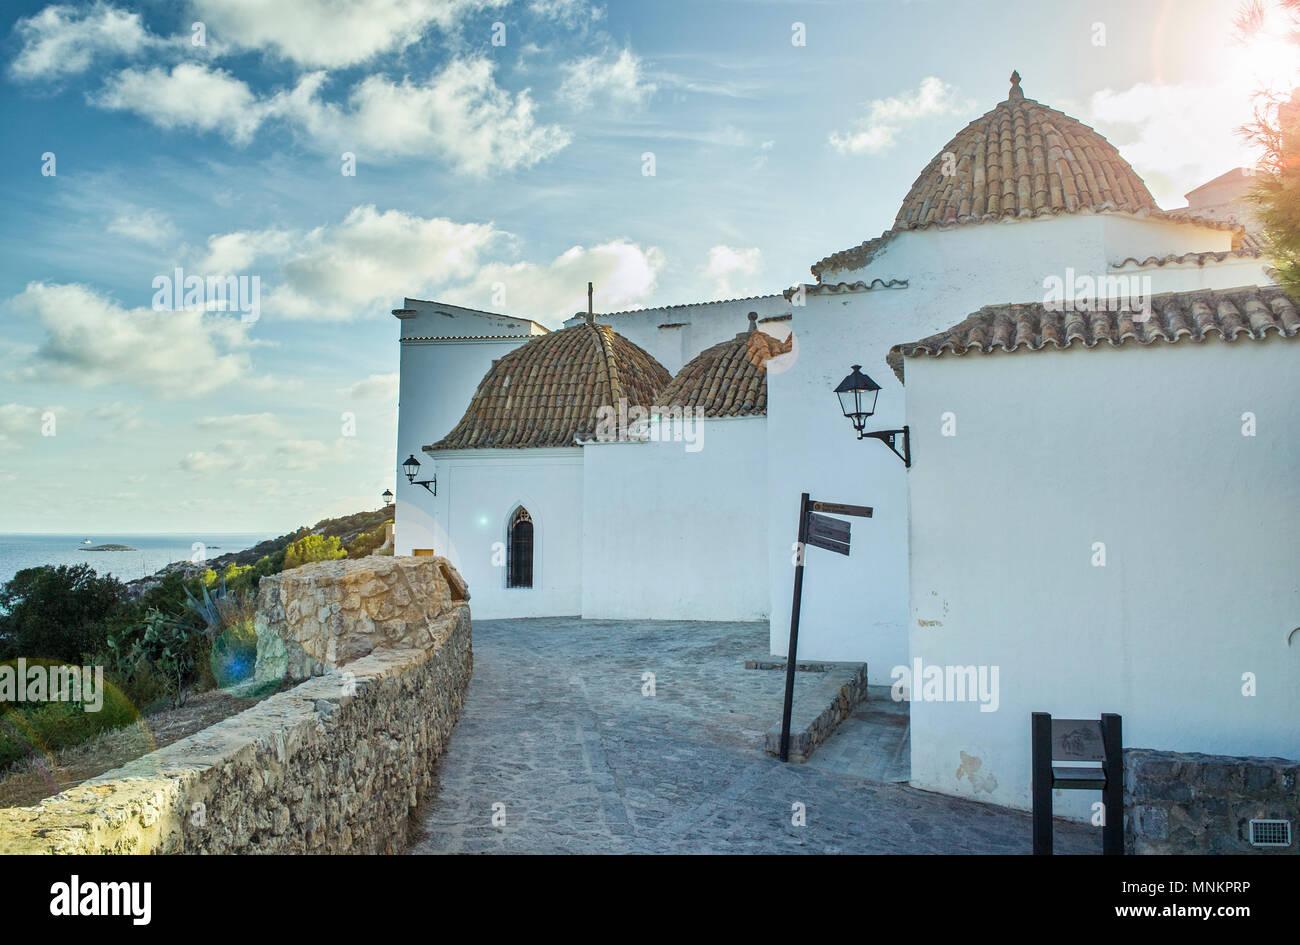 Ibiza Stadt Insel Küste Spanien Stockbild